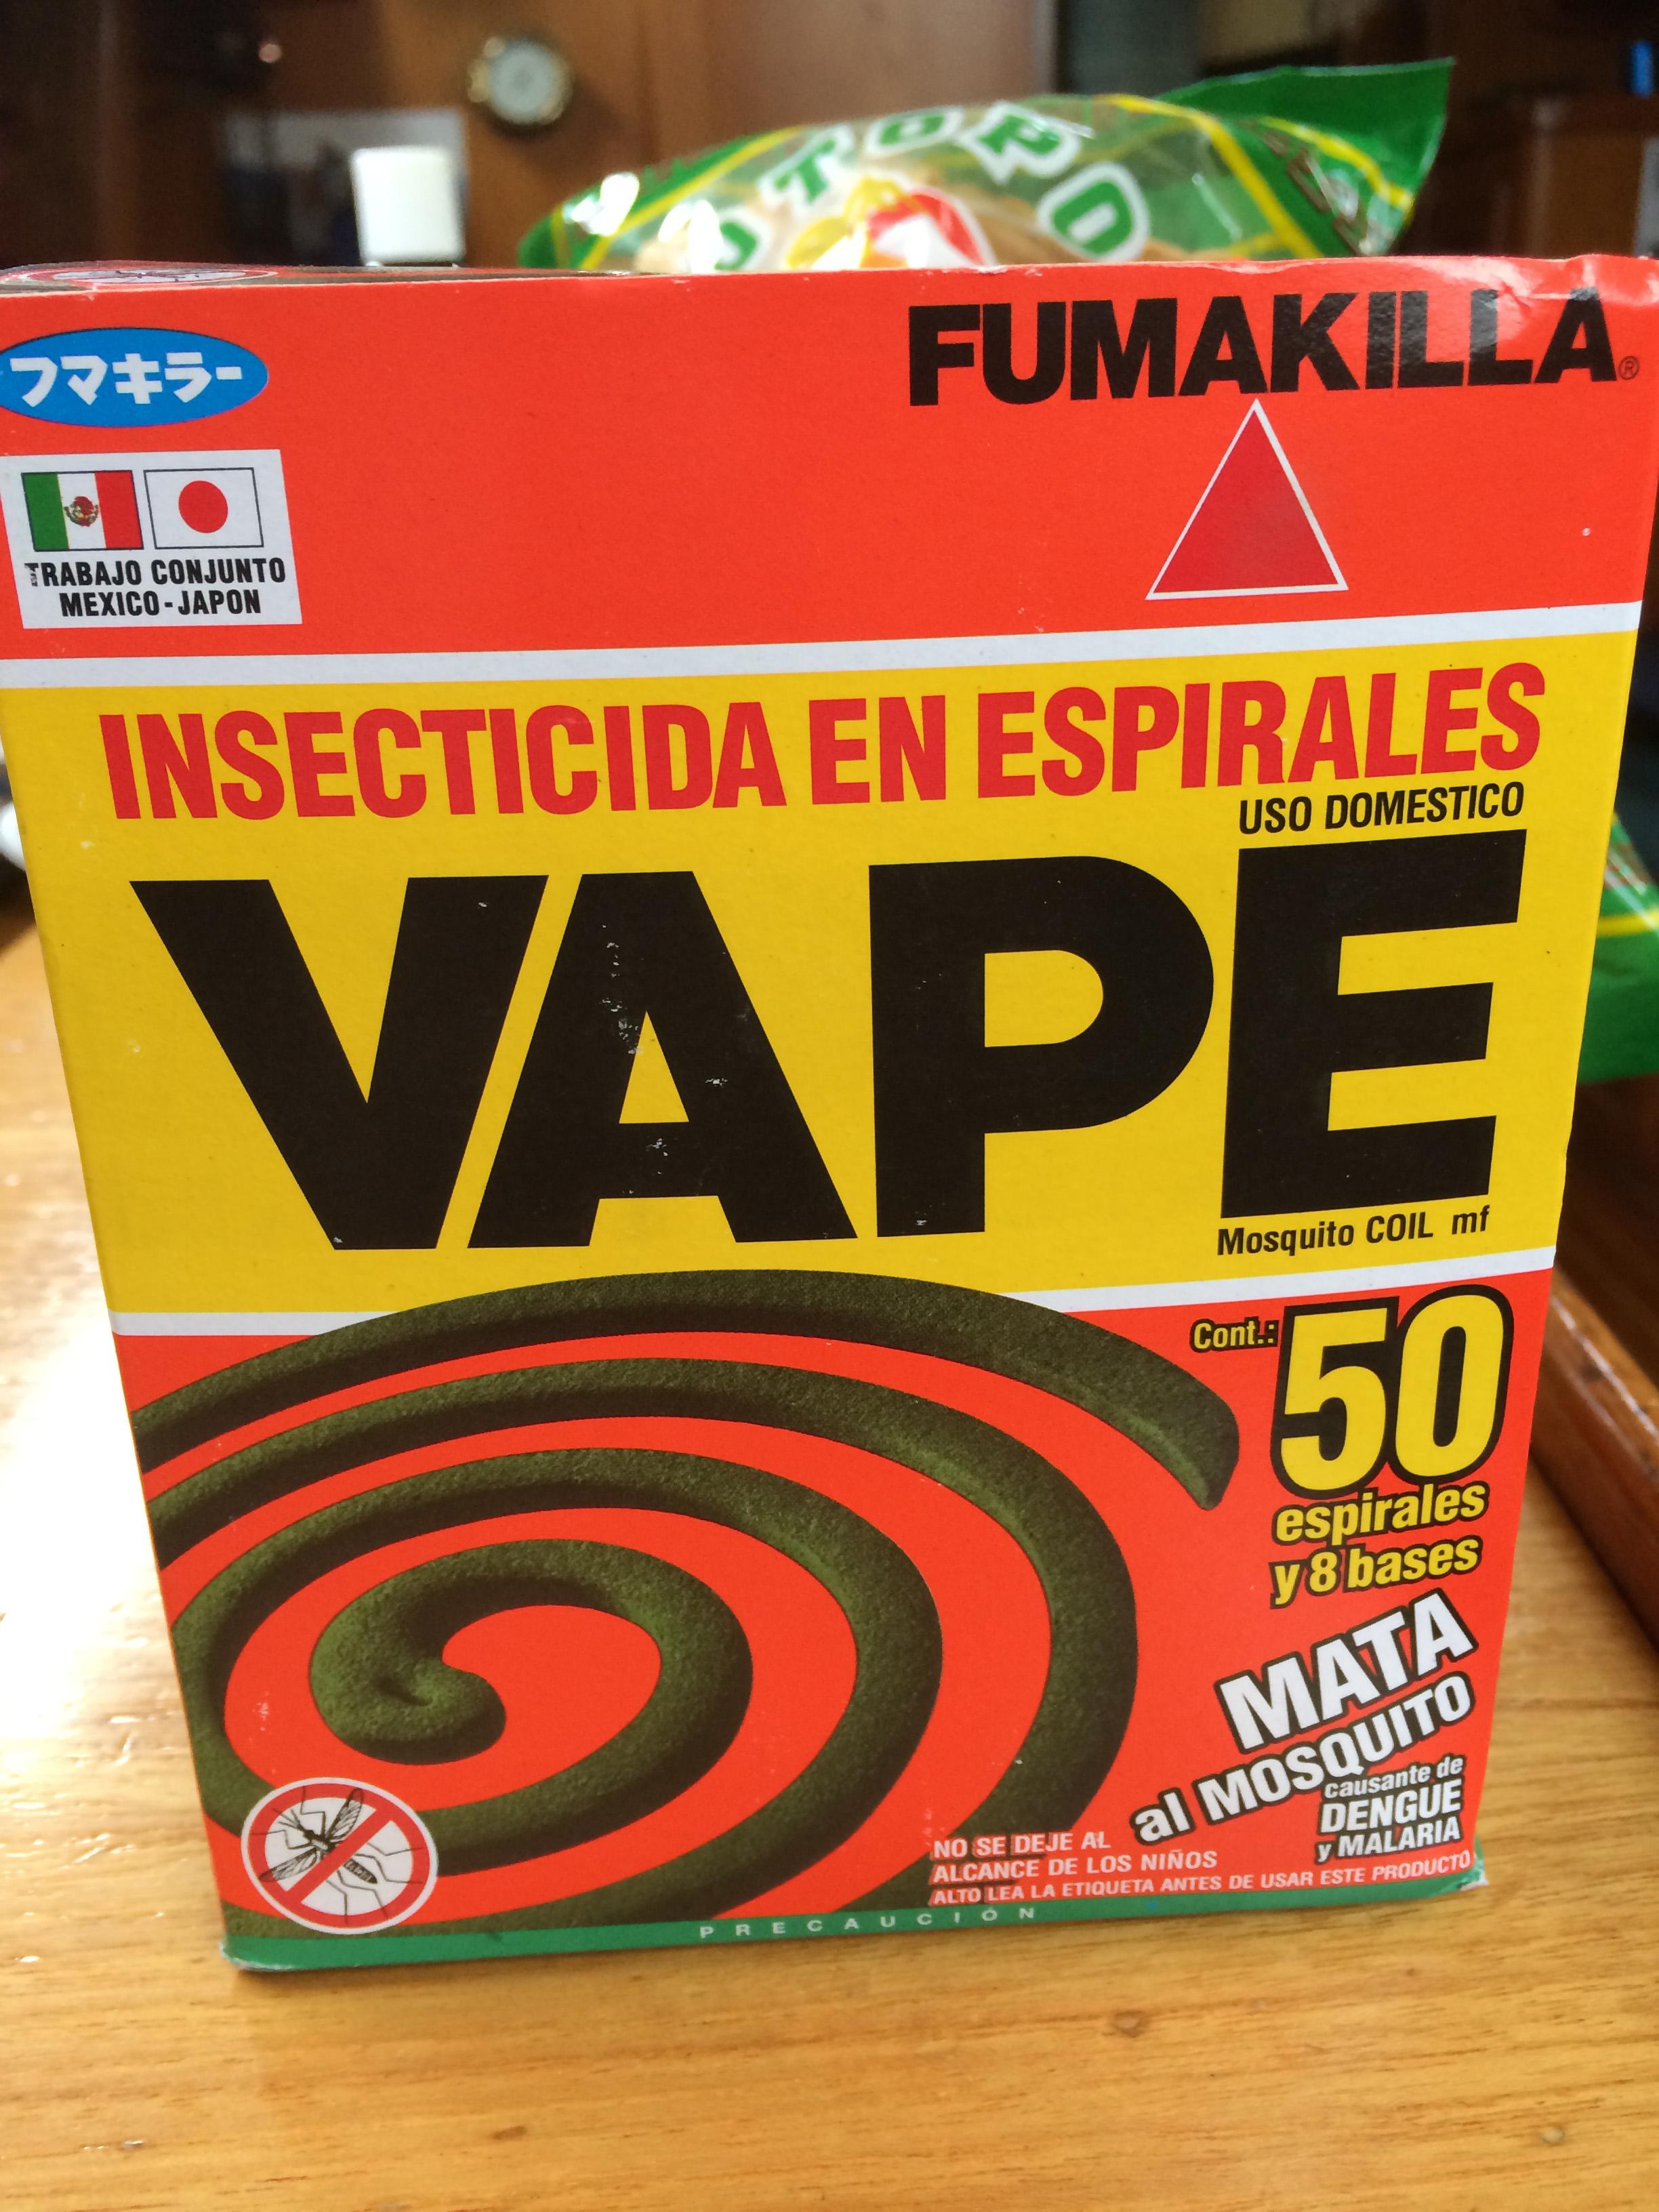 """Fumakilla"" says it all..."